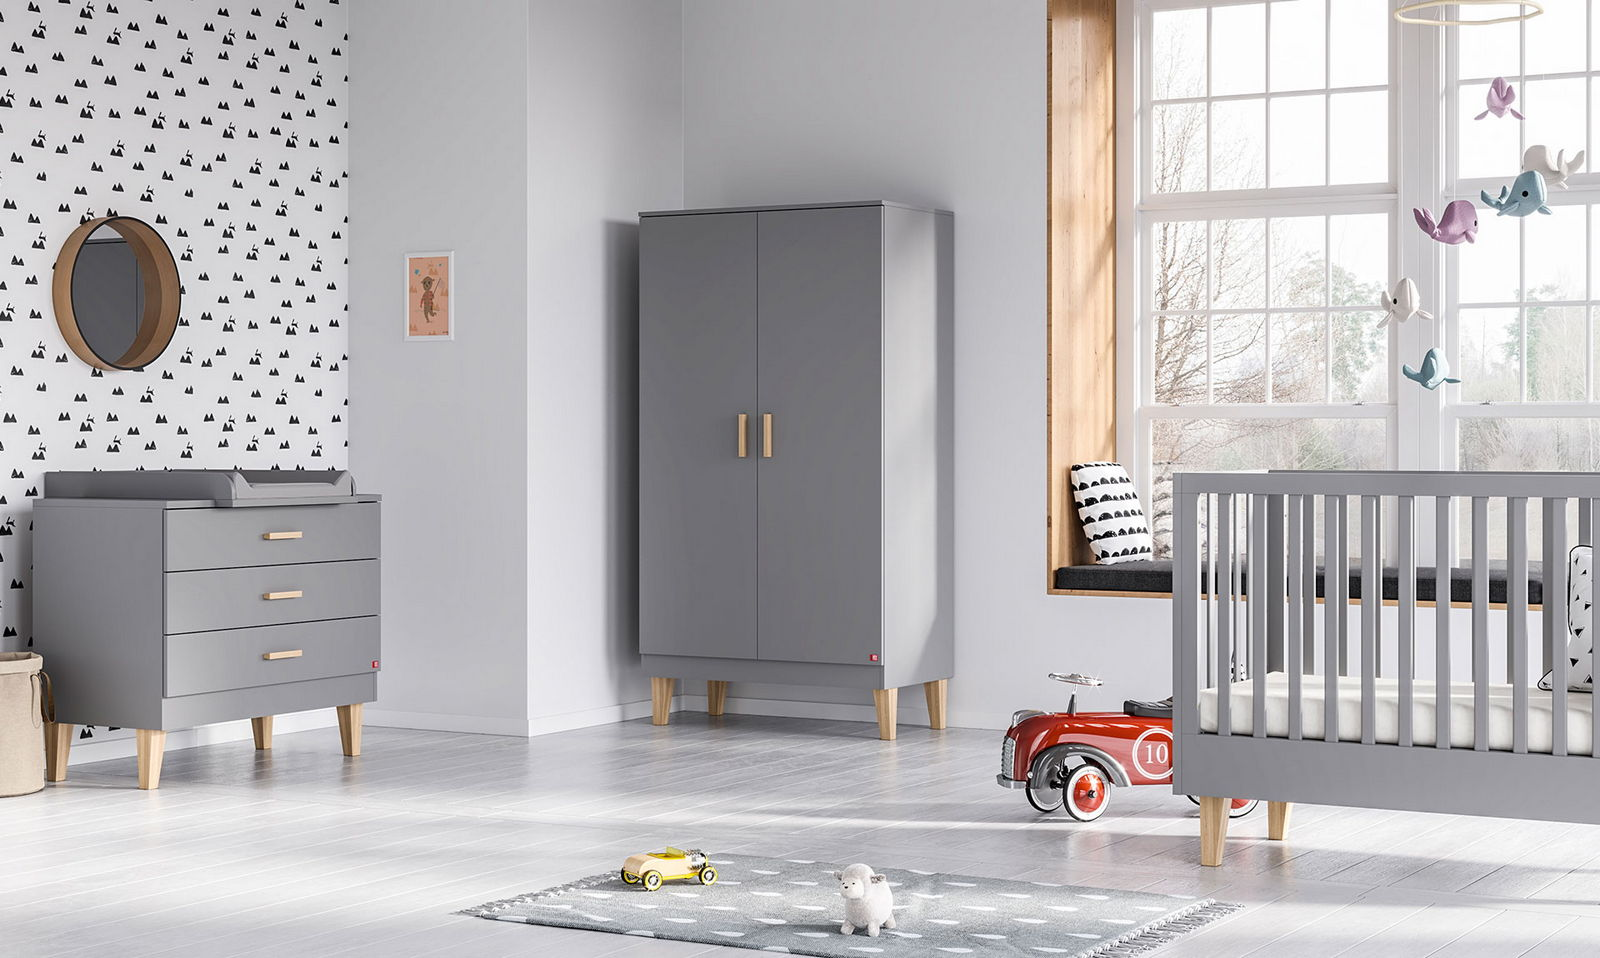 BABY VOX Lounge Gris - 3 meubles - lit 140x70, commode, armoire 2 portes